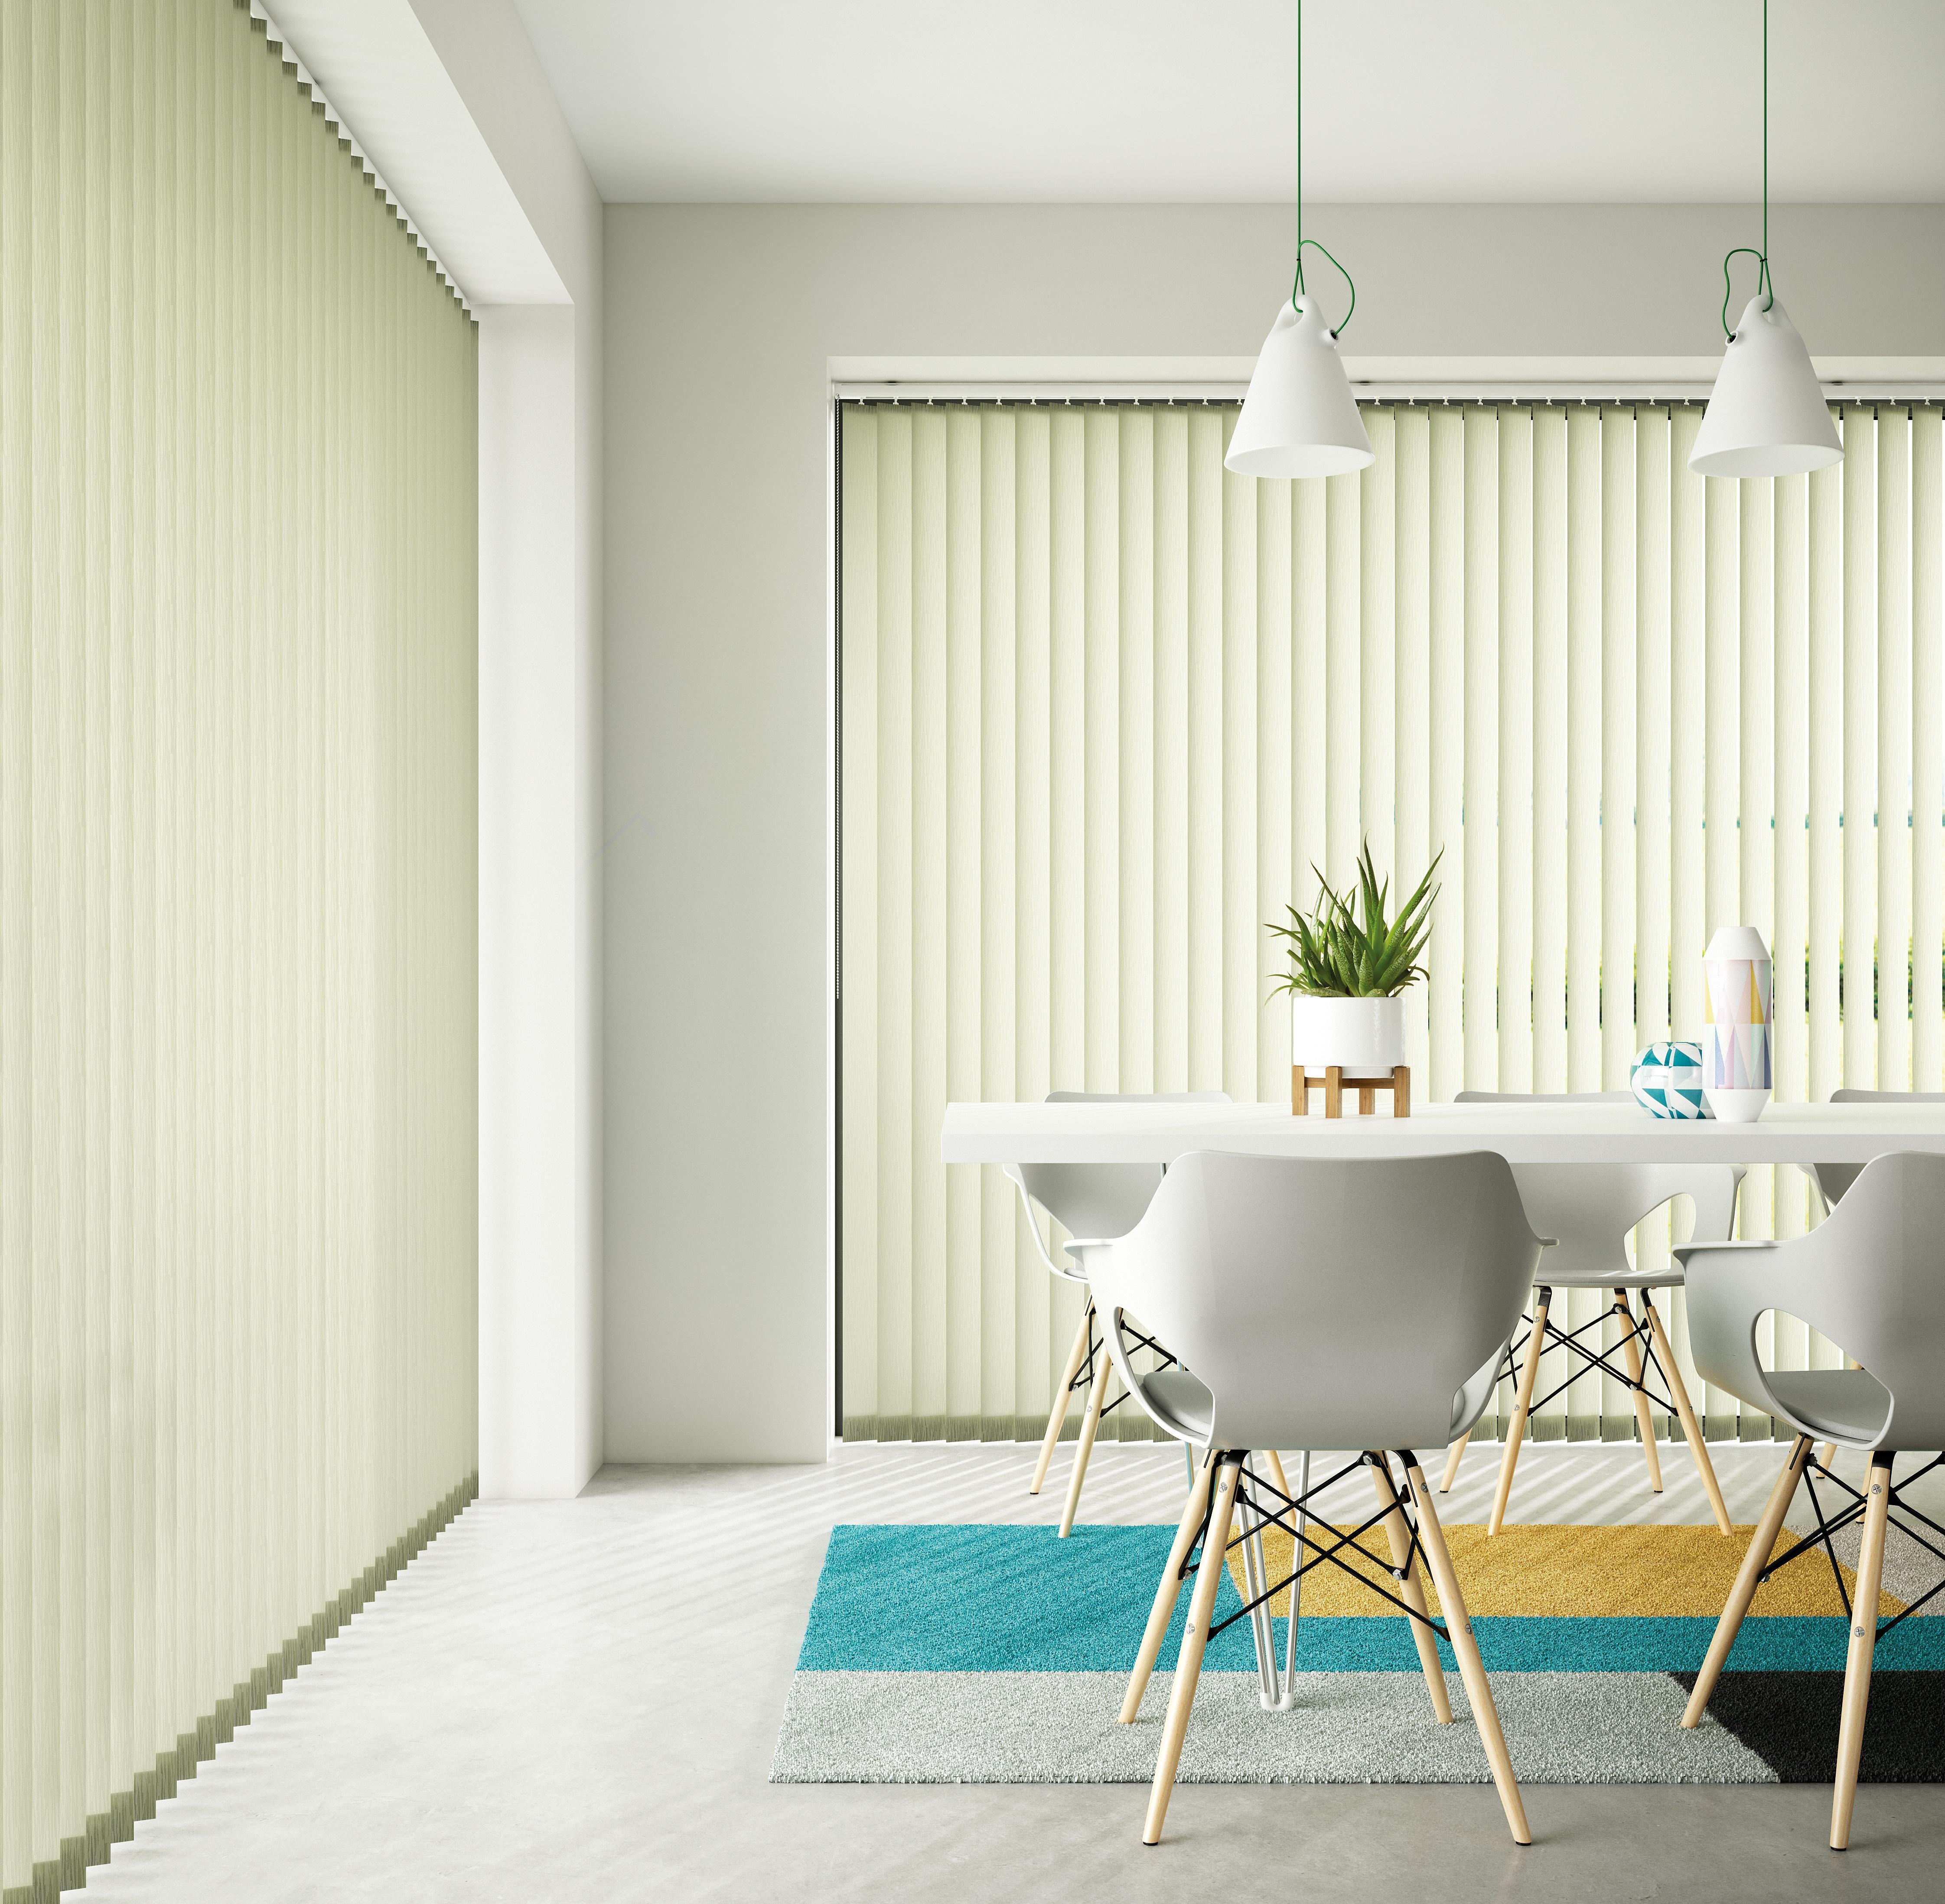 Decora 89mm Fabric Box Yellow-Green Vertical Blind